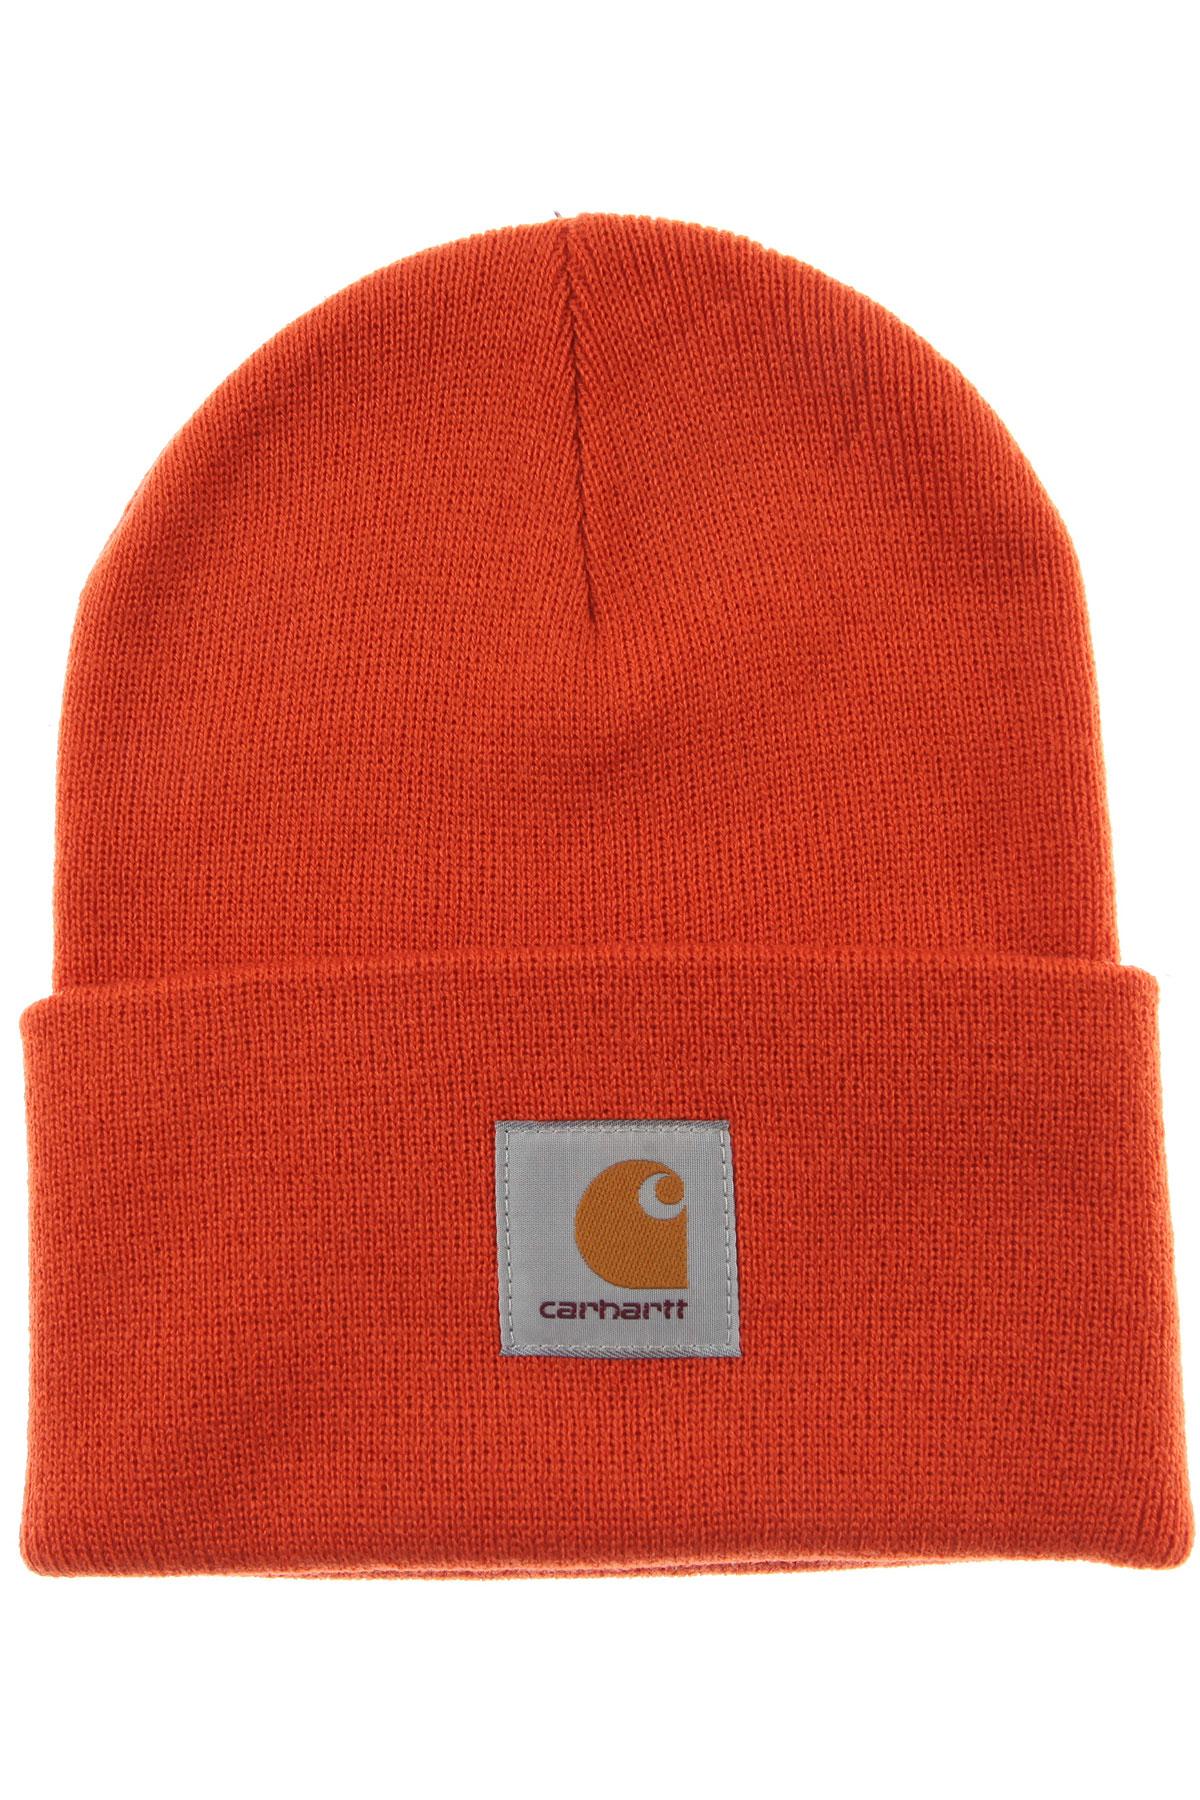 Image of Carhartt Hat for Women, Orange, Acrylic, 2017